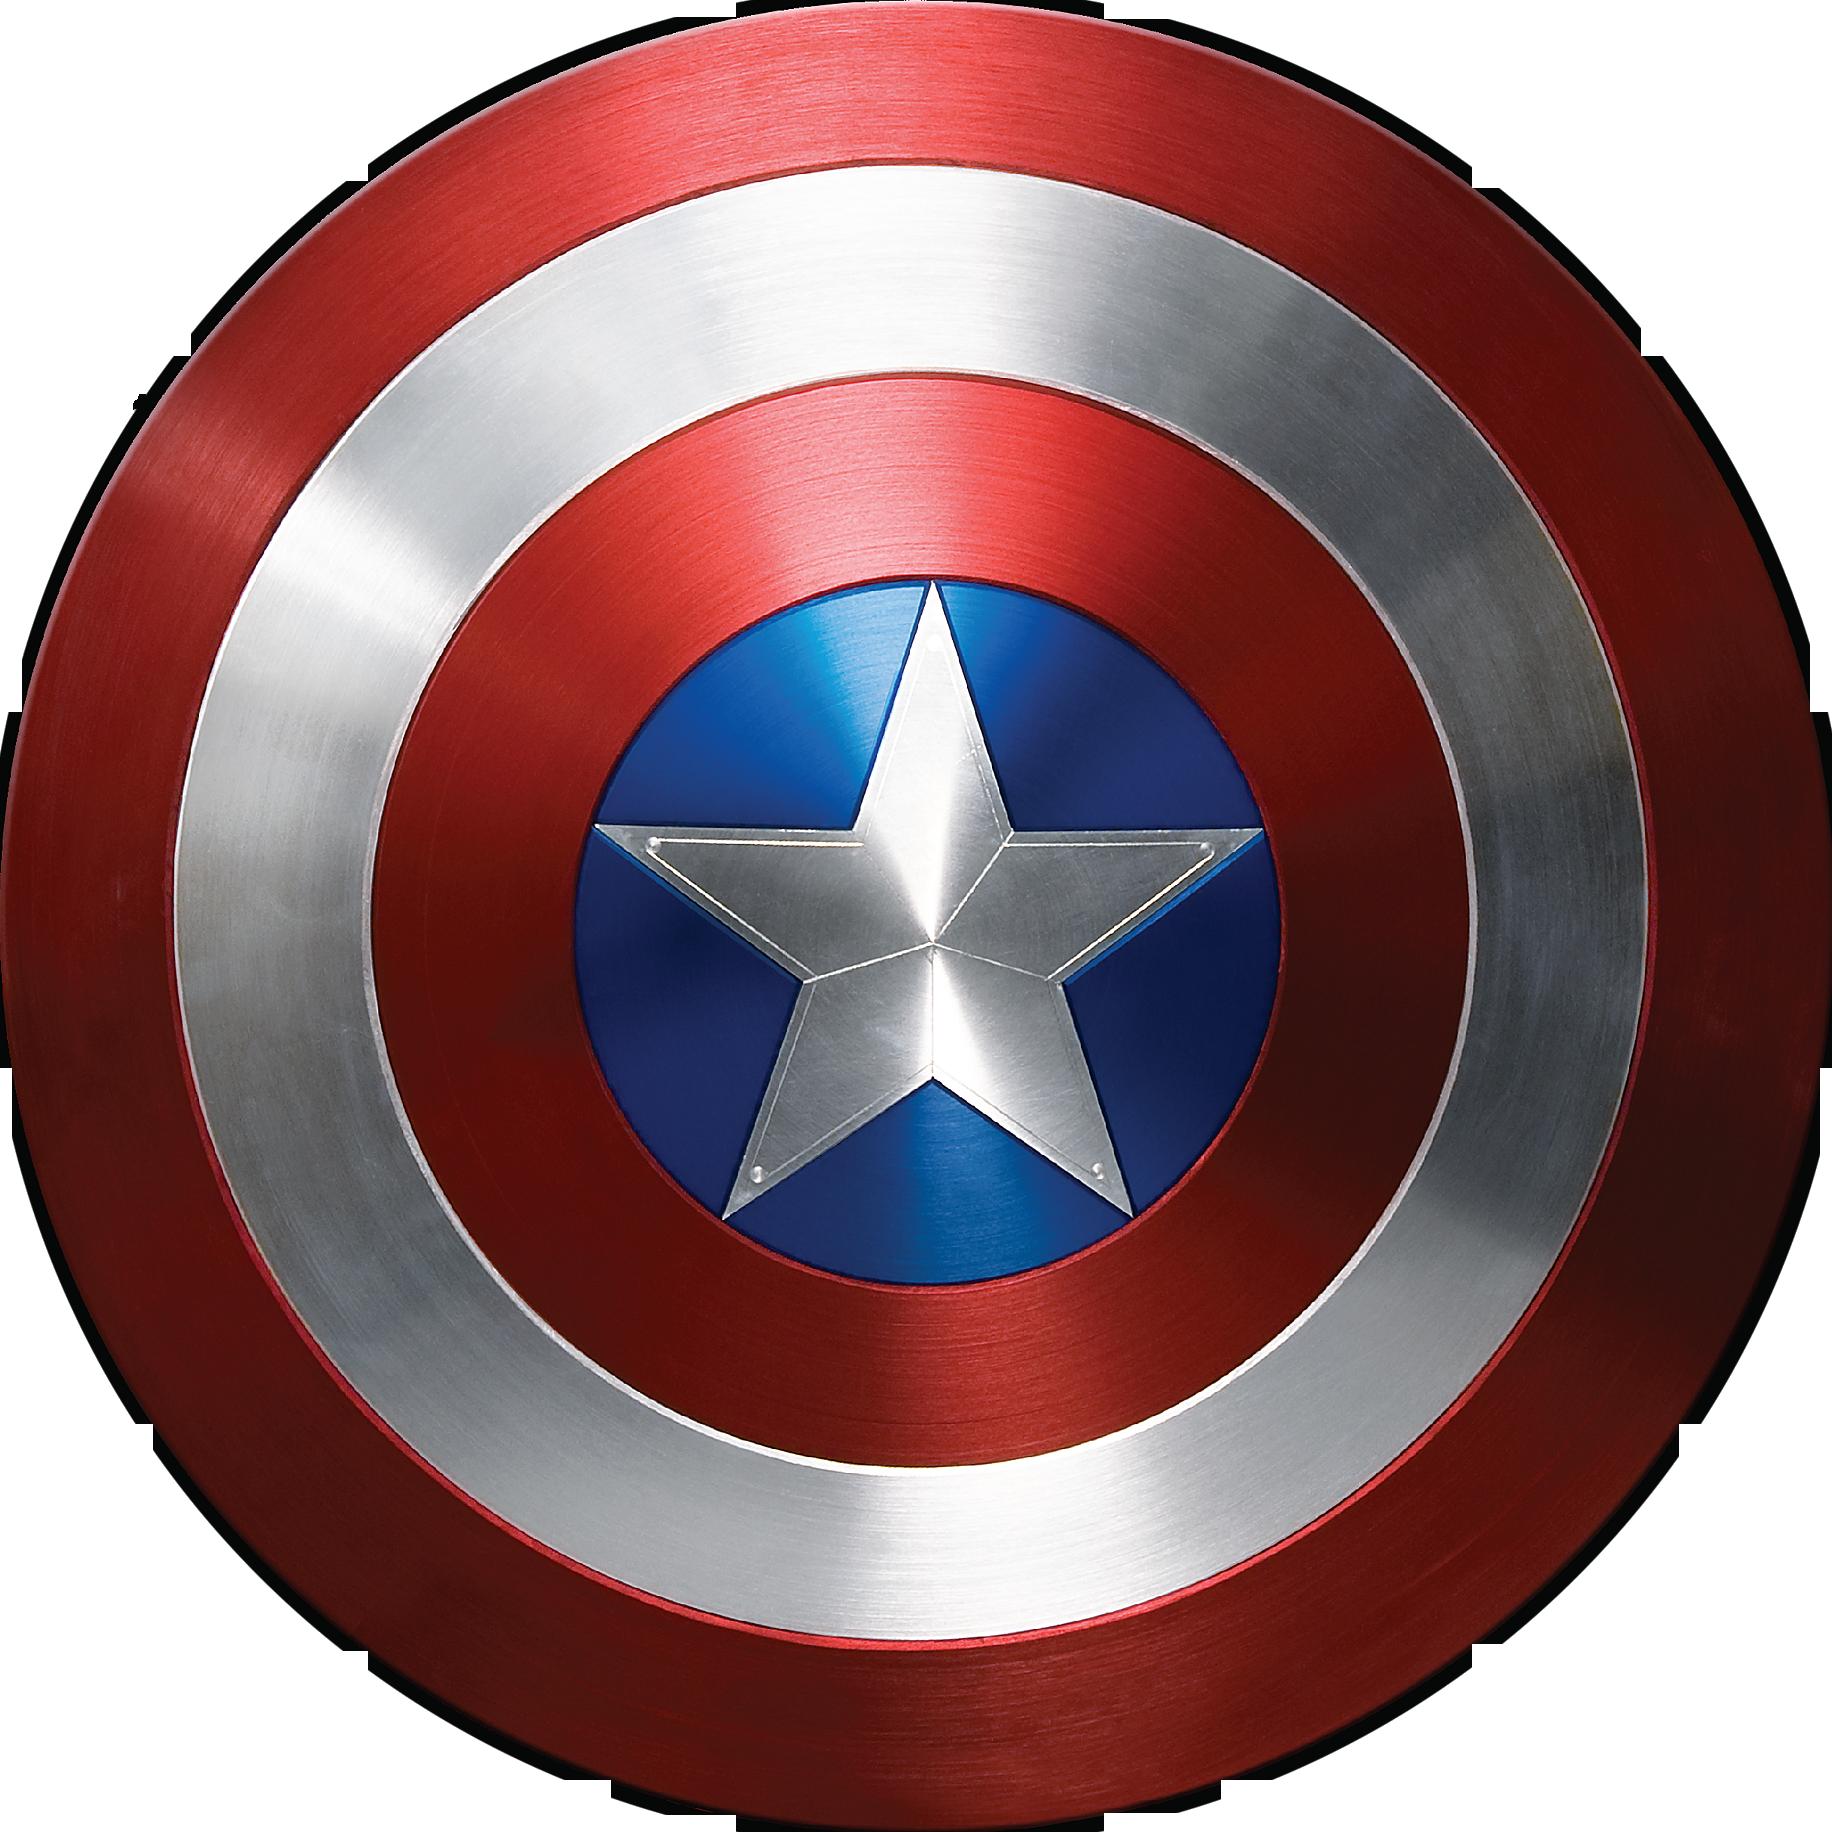 captain americas schild marvel filme wiki fandom. Black Bedroom Furniture Sets. Home Design Ideas